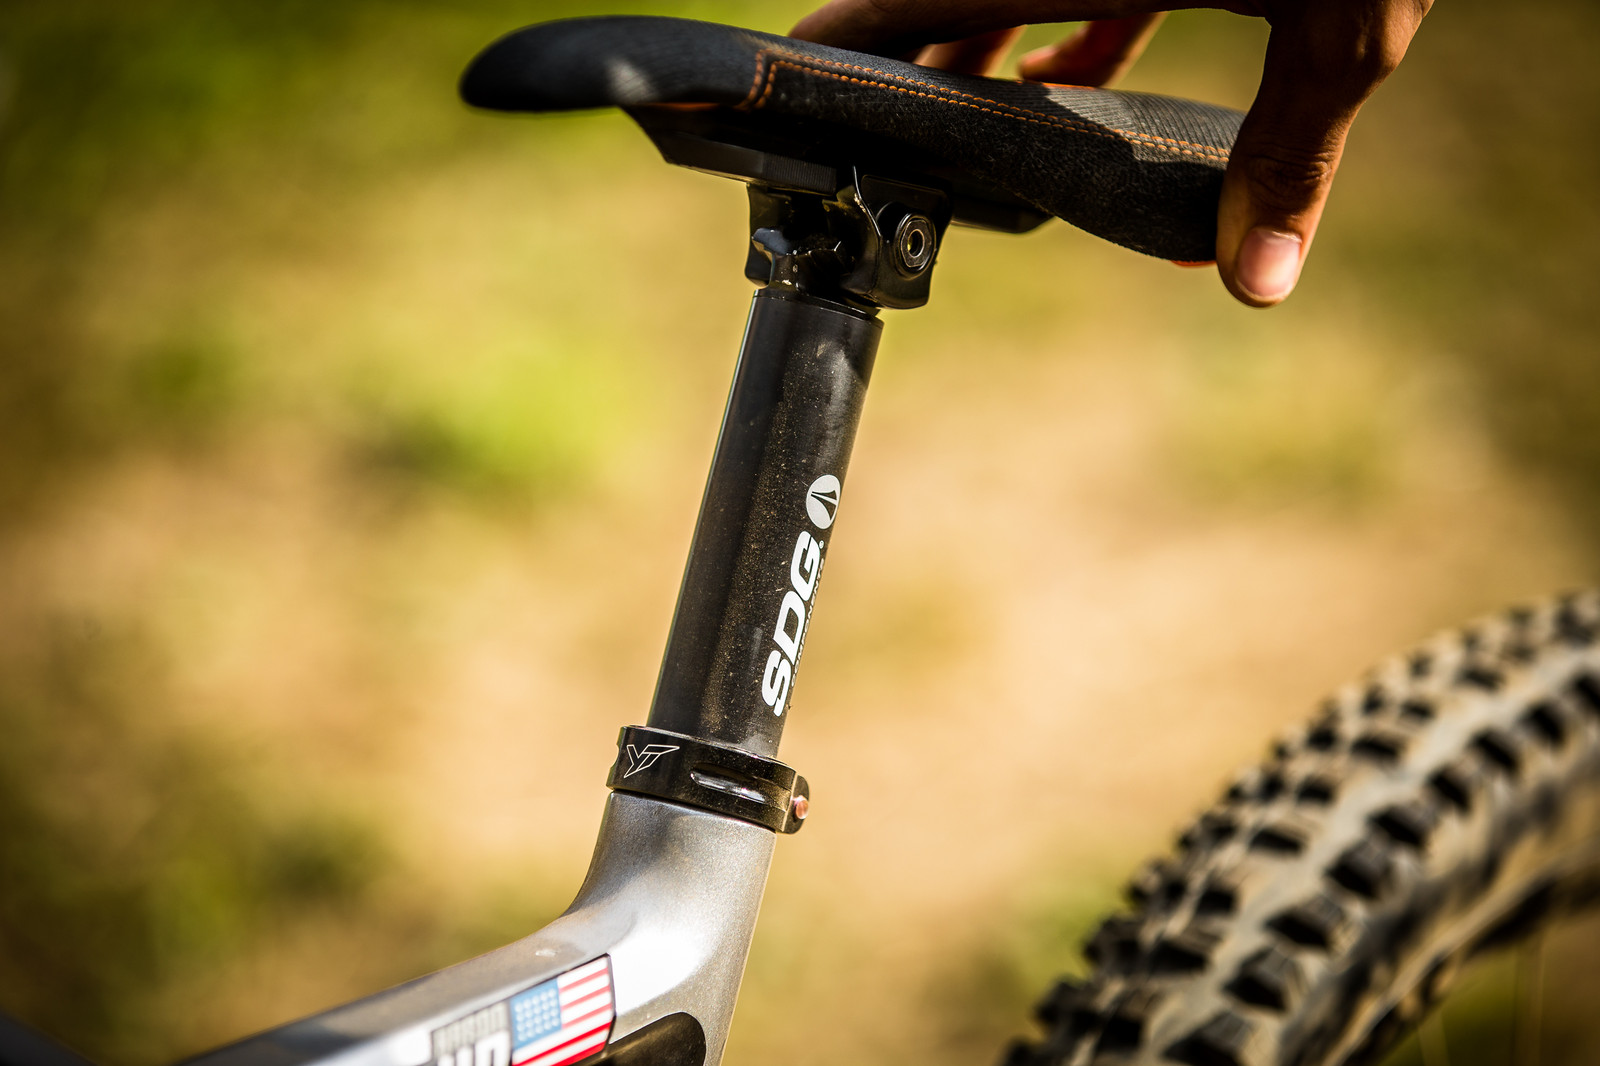 SDG I-Beam Saddle and Post - WINNING BIKE: Aaron Gwin's YT TUES - Mountain Biking Pictures - Vital MTB